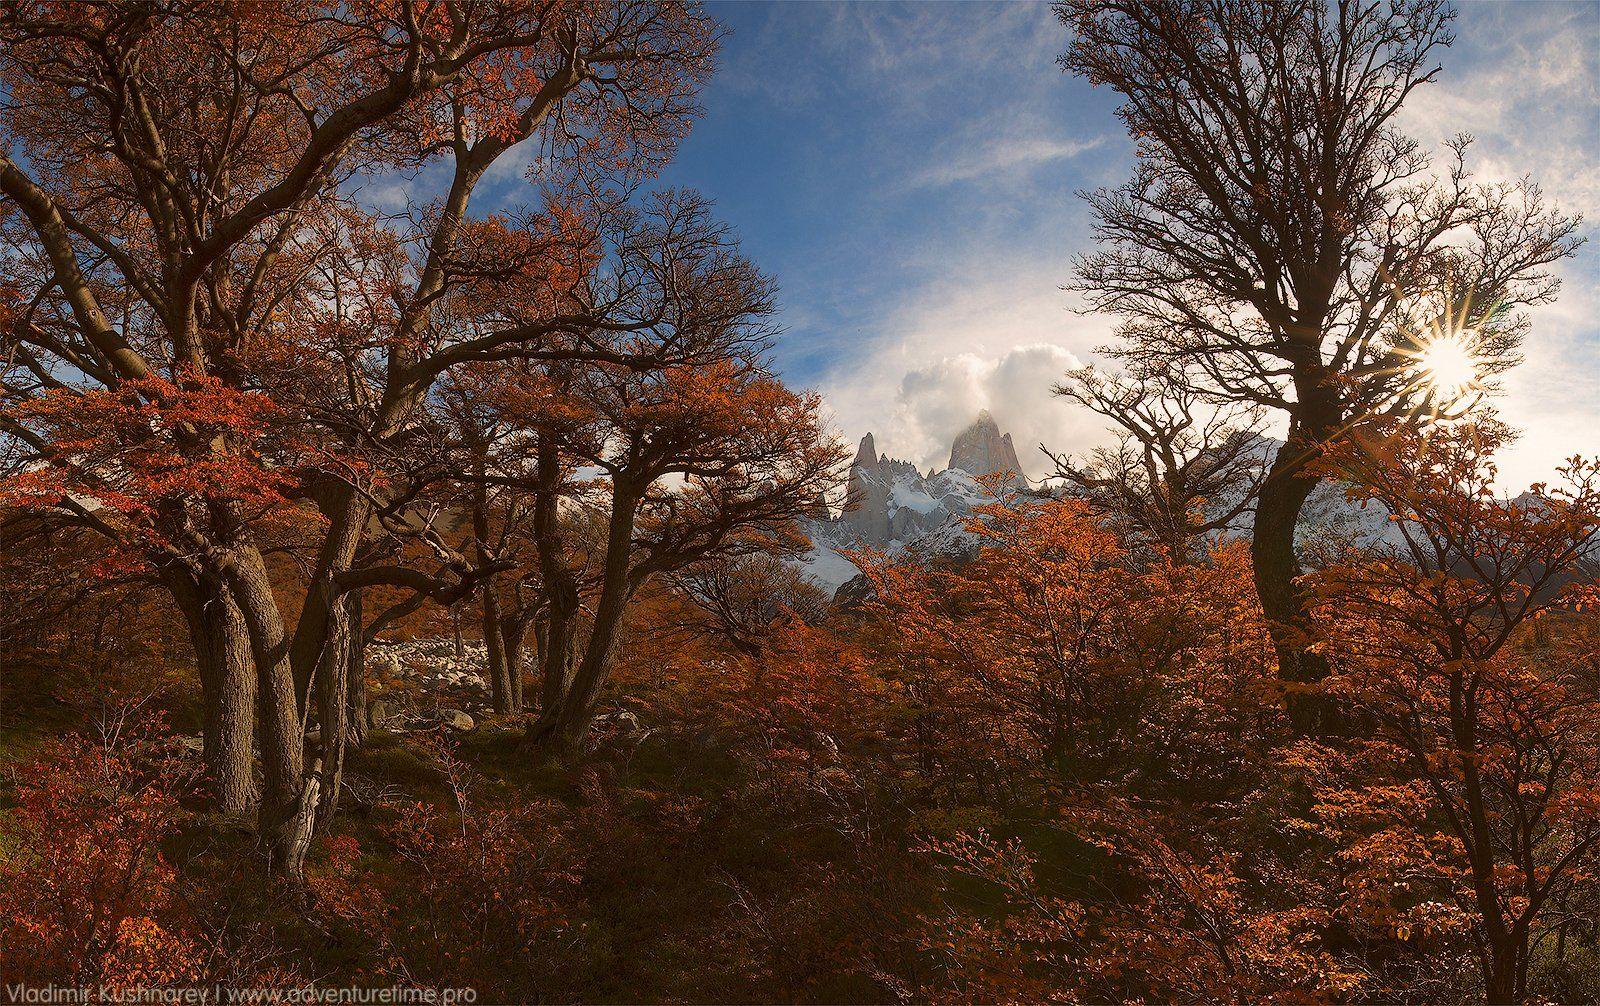 патагония аргентина осень горы пейзаж лес облака, Vladimir Kushnarev